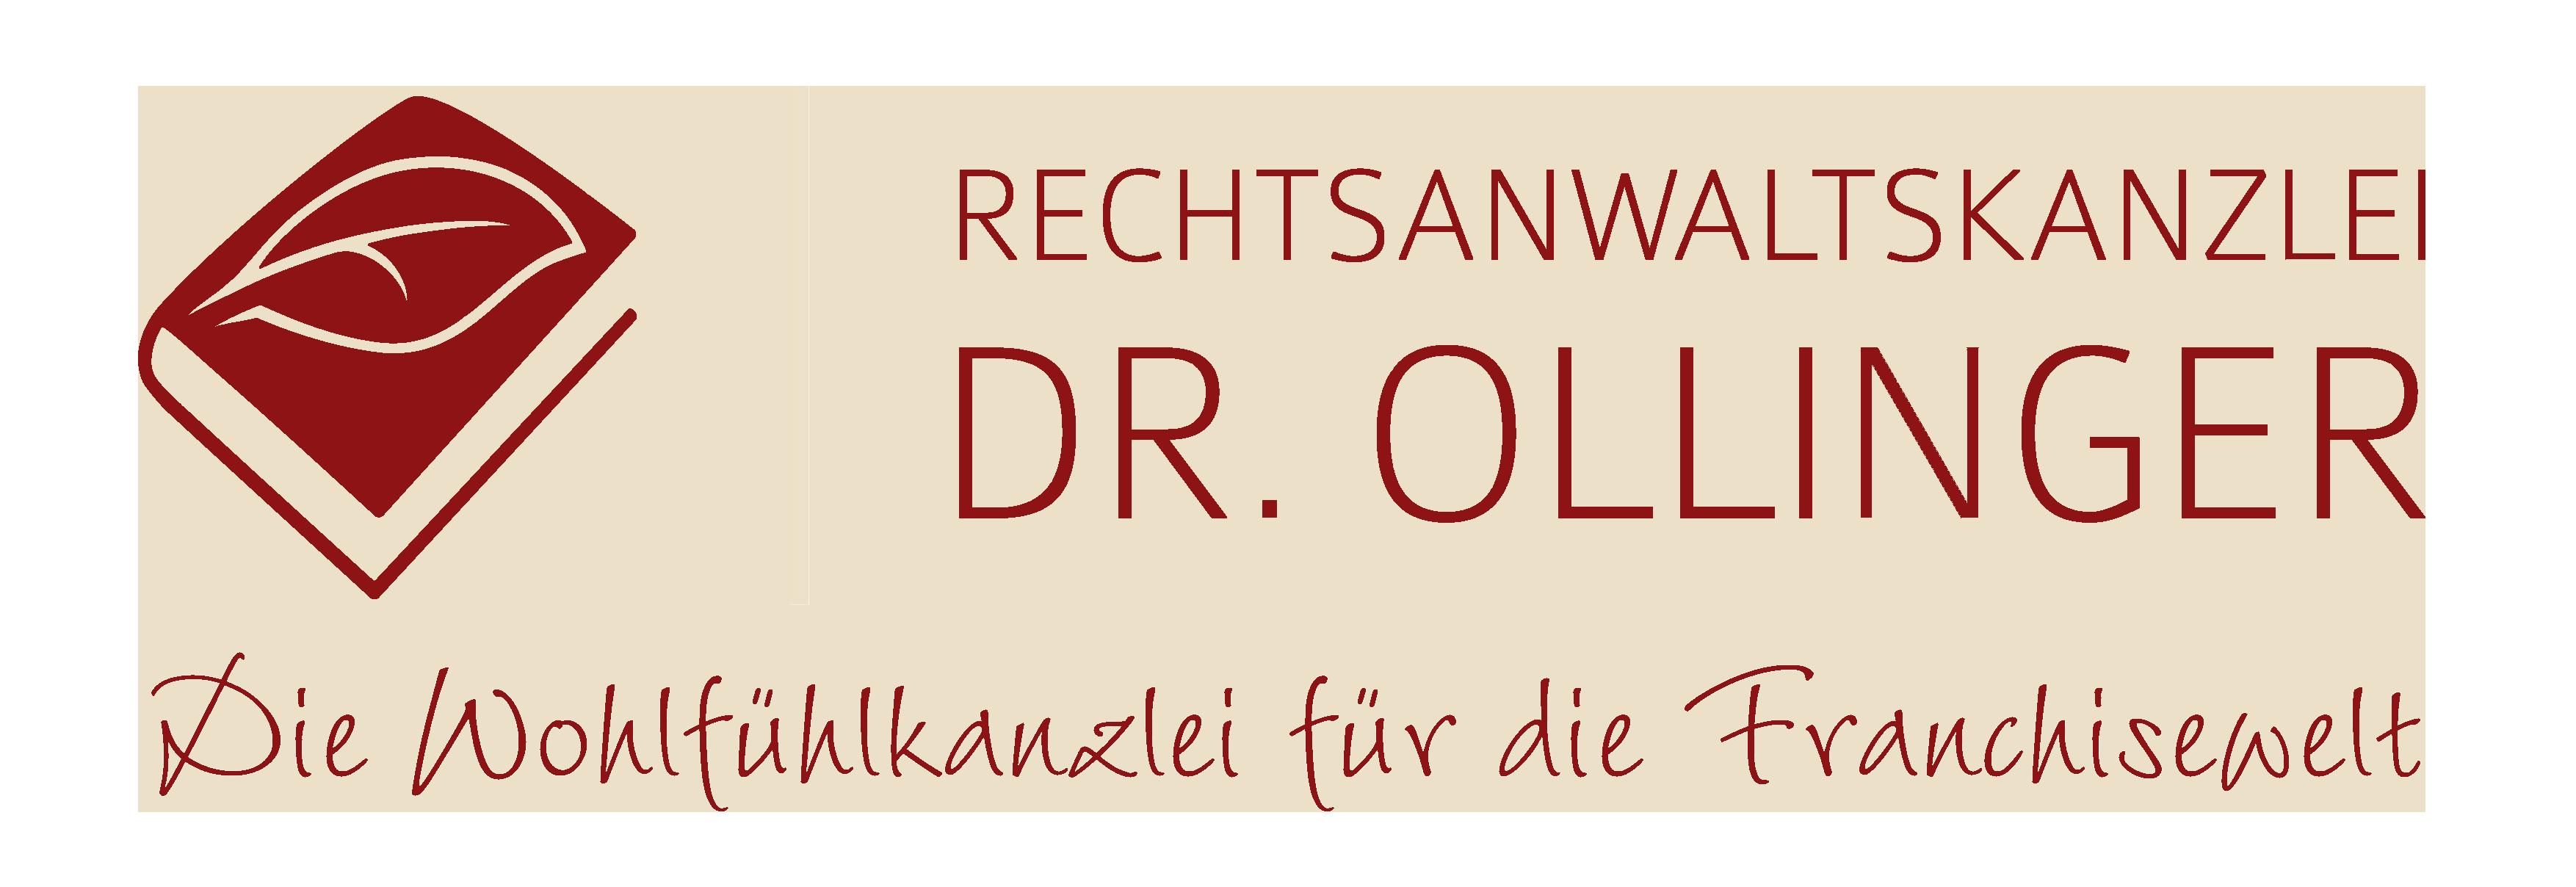 Franchise-Rechtsanwalt Dr. Ollinger